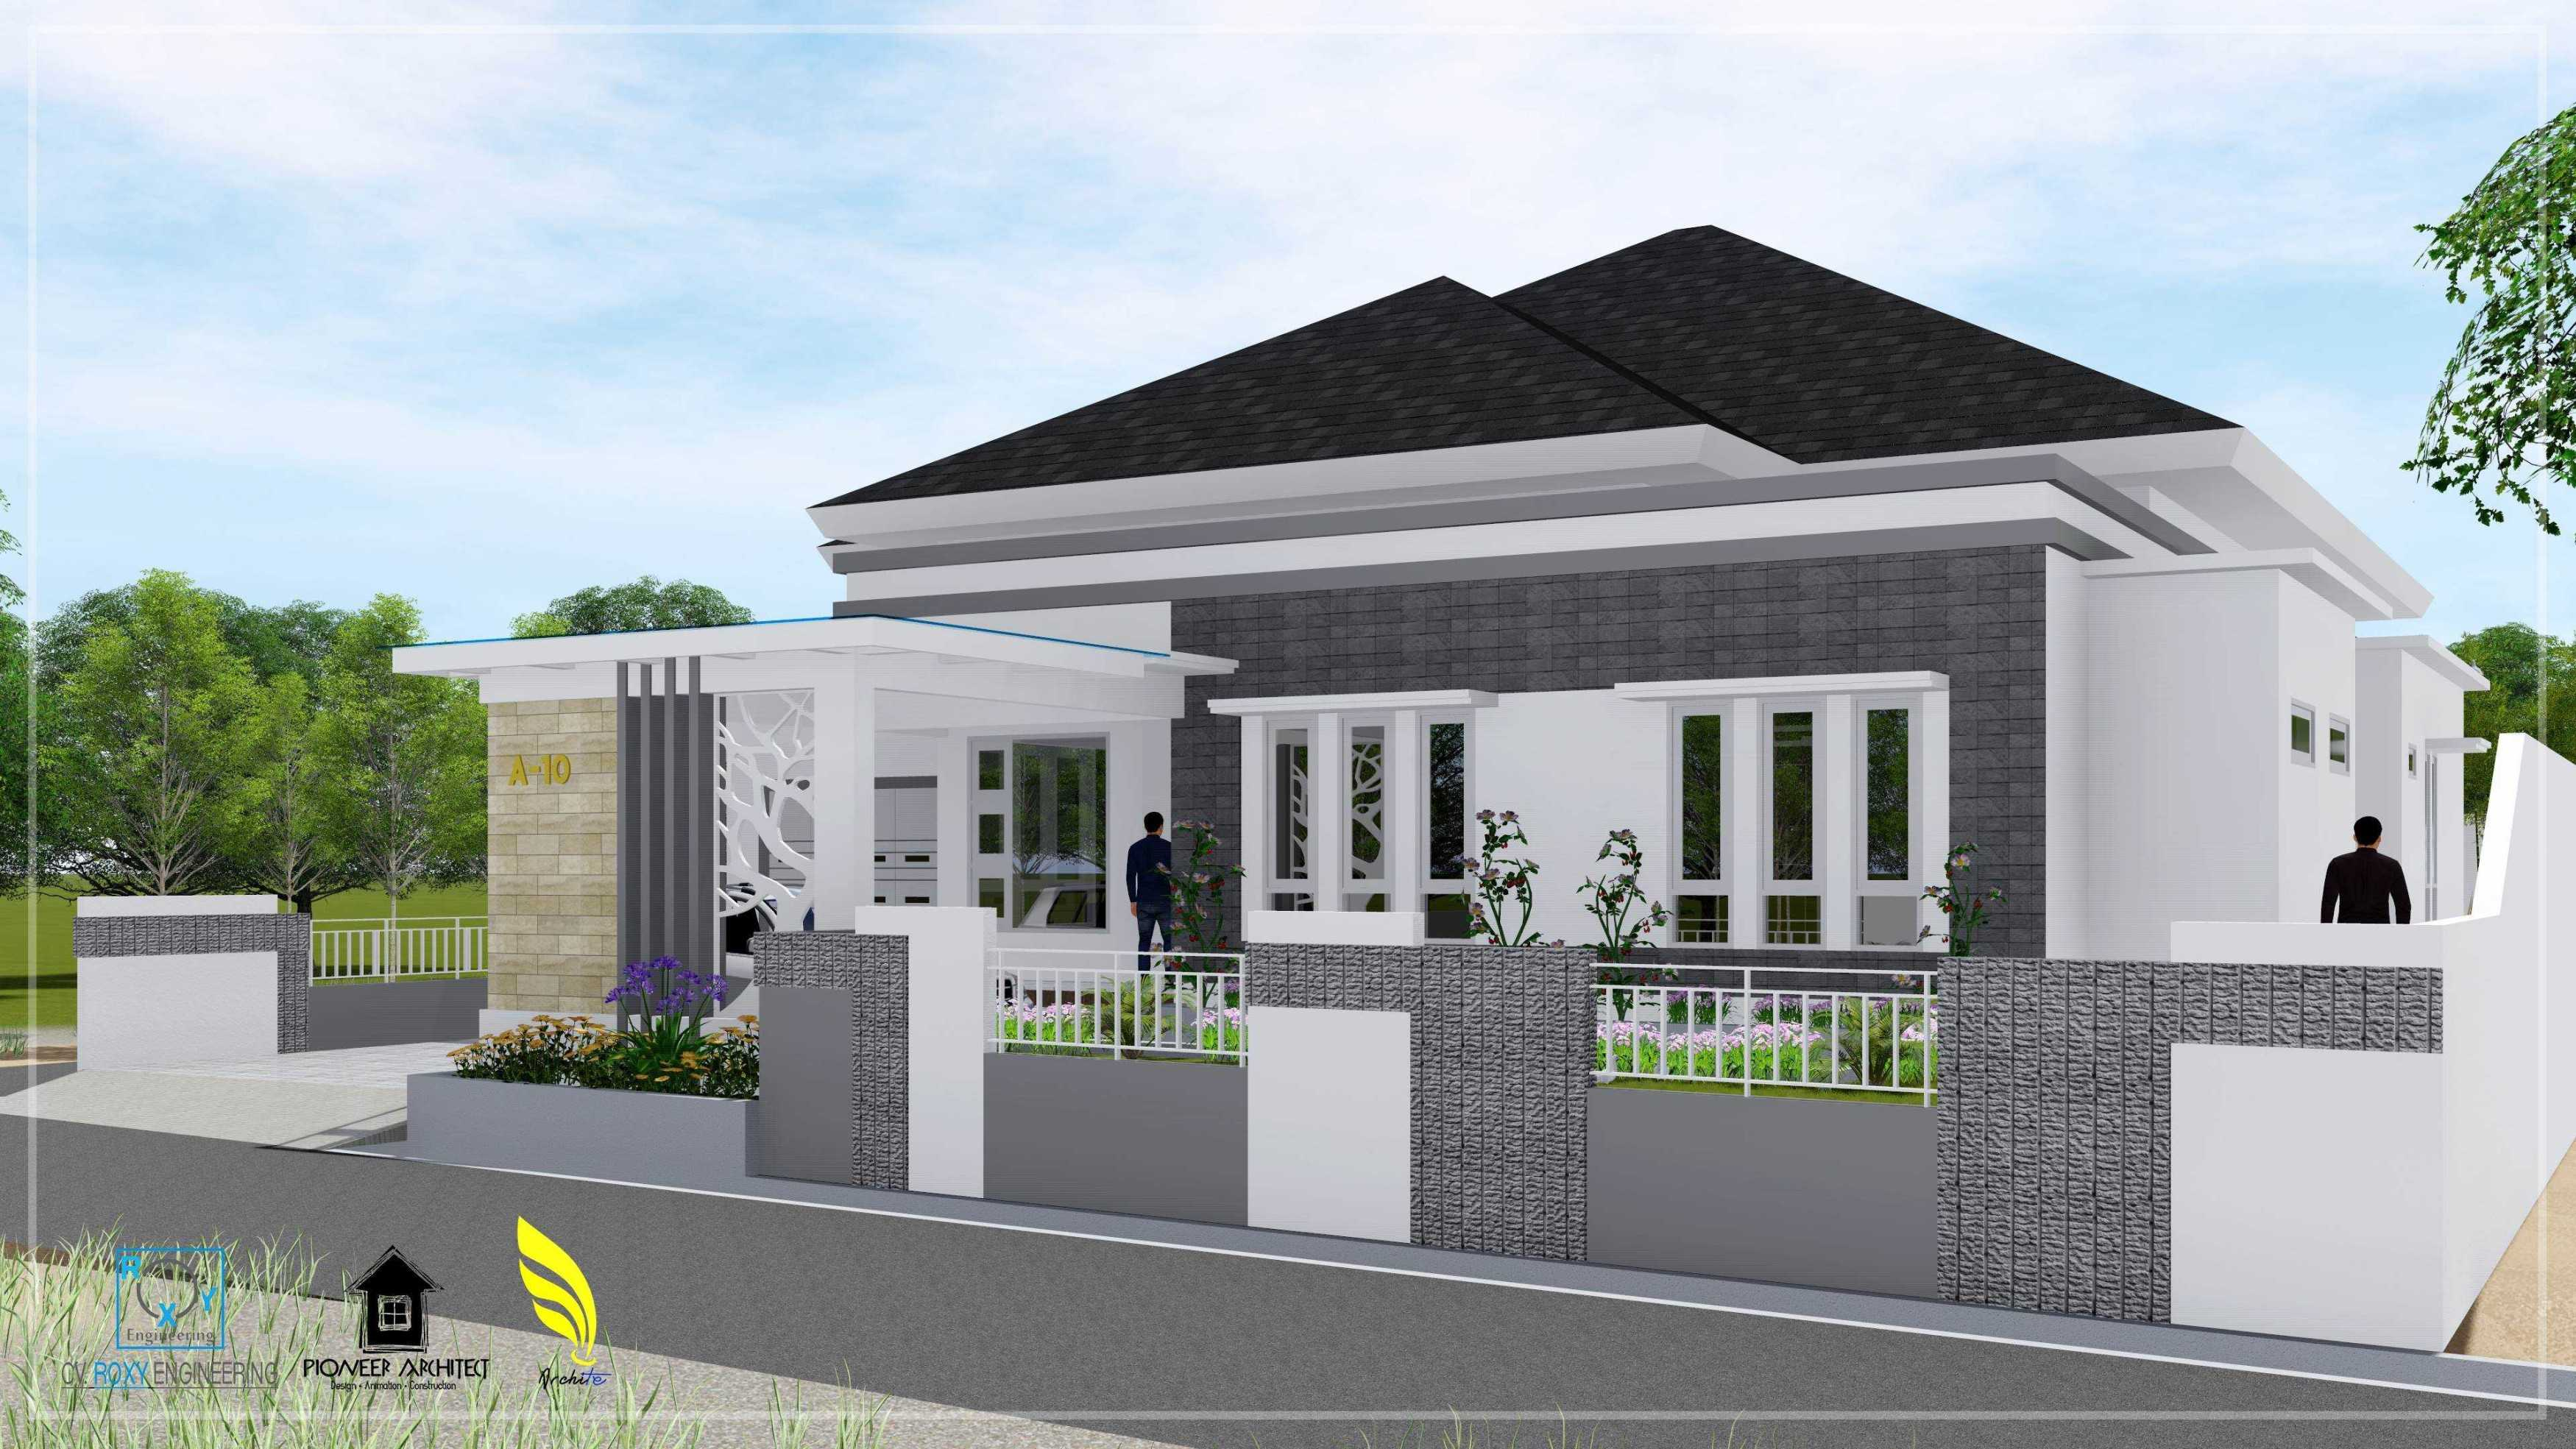 Pionner Architect H House Banda Aceh, Kota Banda Aceh, Aceh, Indonesia Banda Aceh, Kota Banda Aceh, Aceh, Indonesia Exterior View   43247